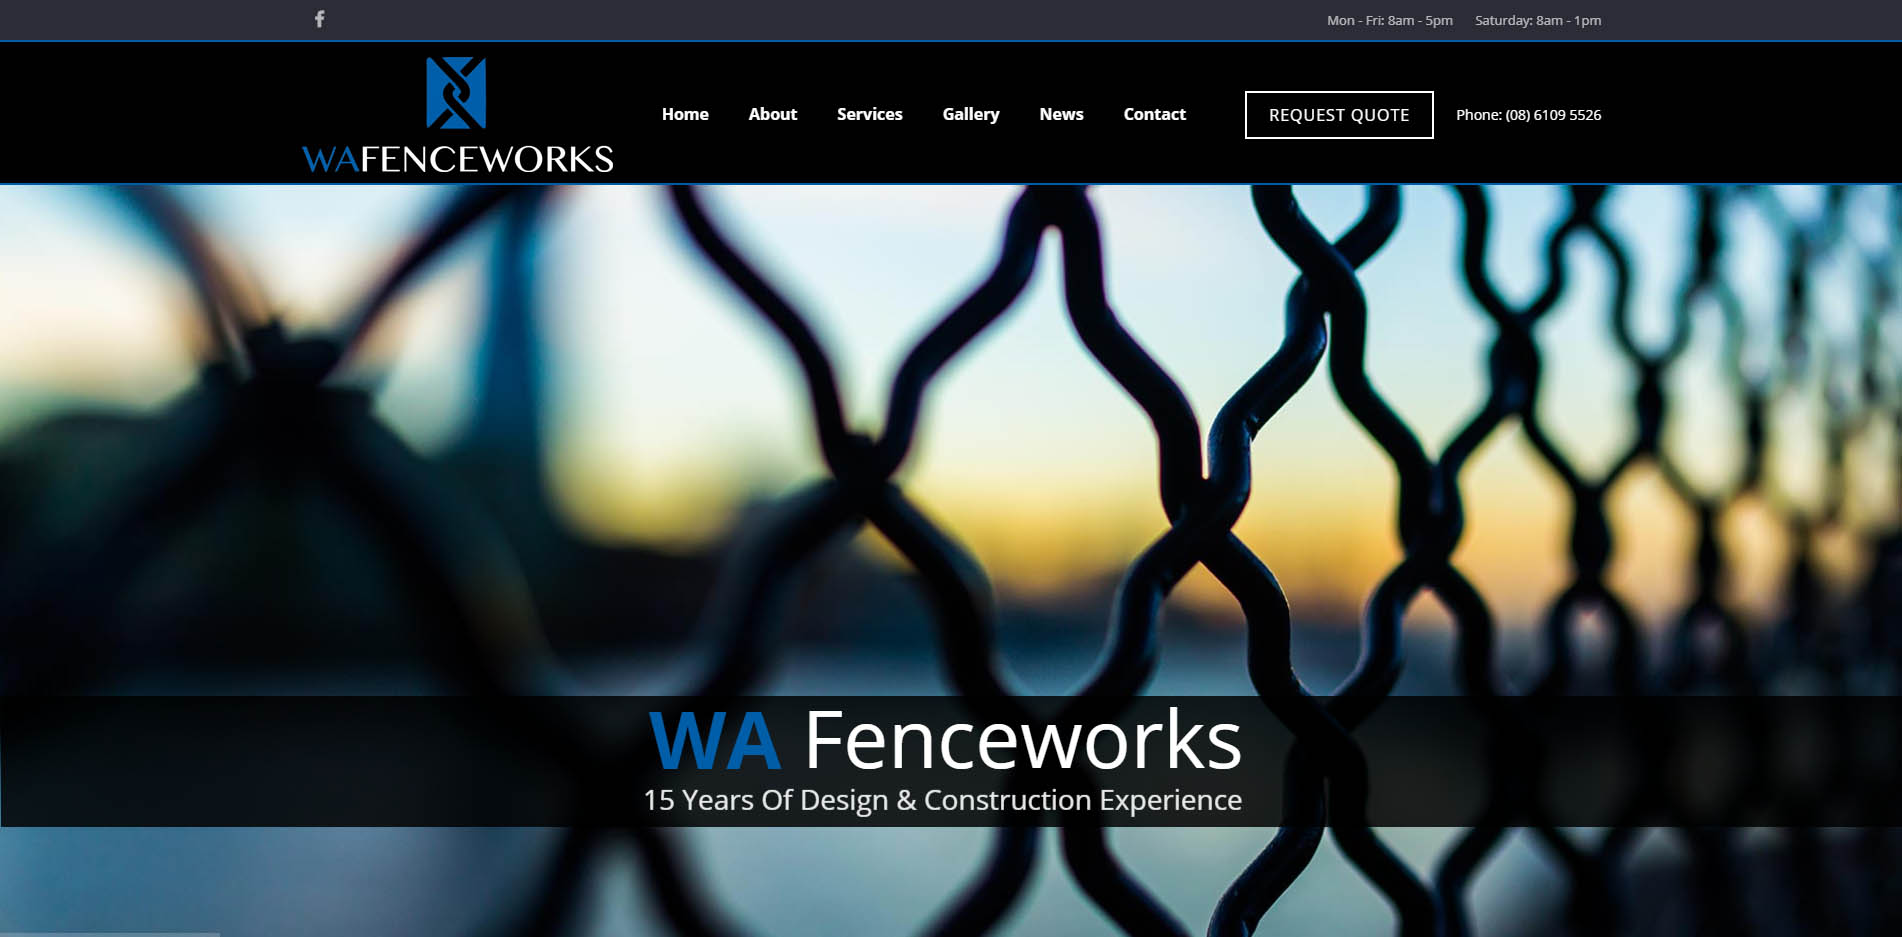 WA Fenceworks